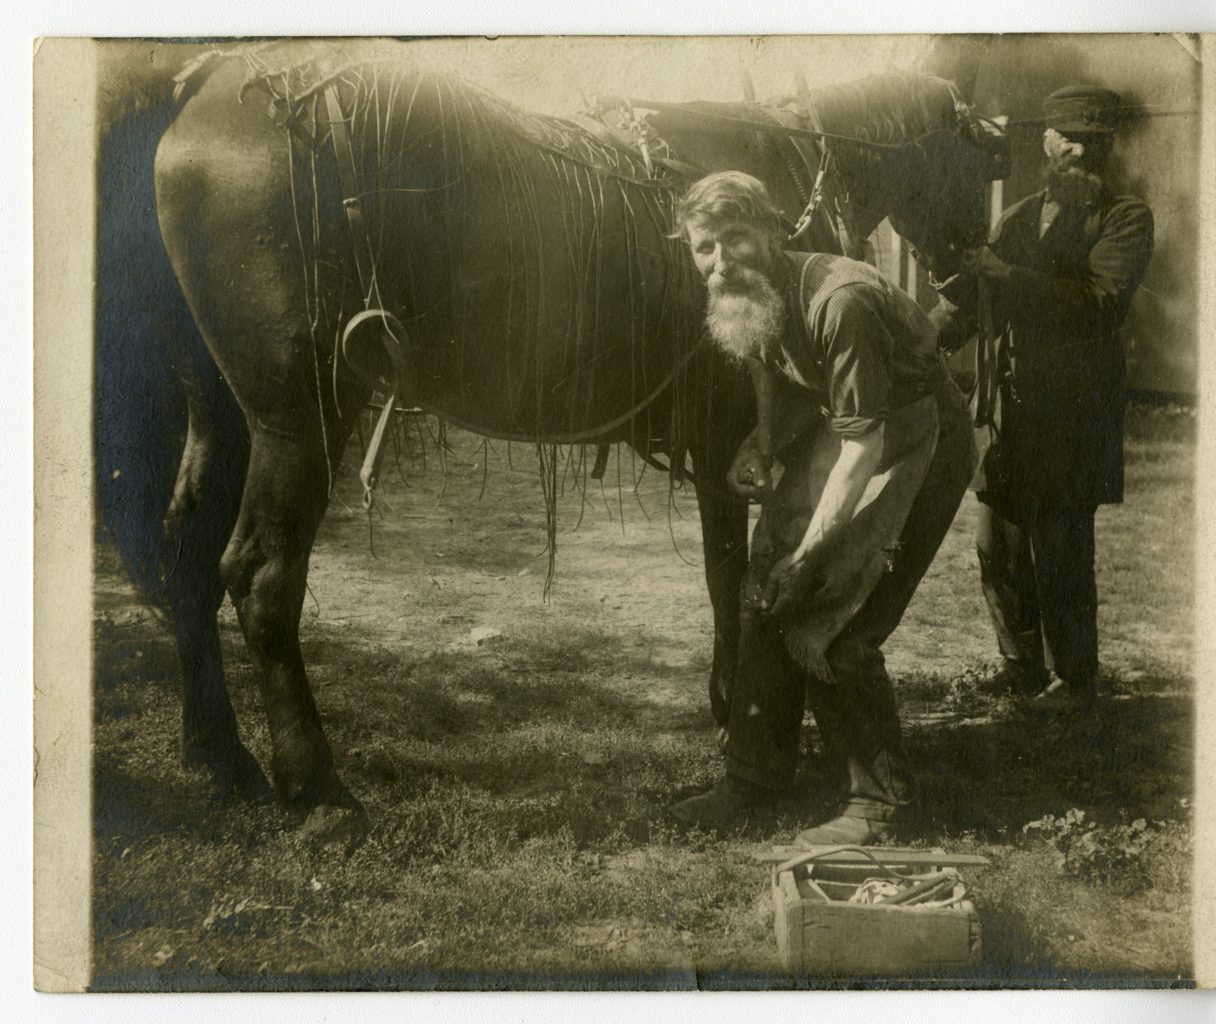 Ole and Halvor work on a horse.